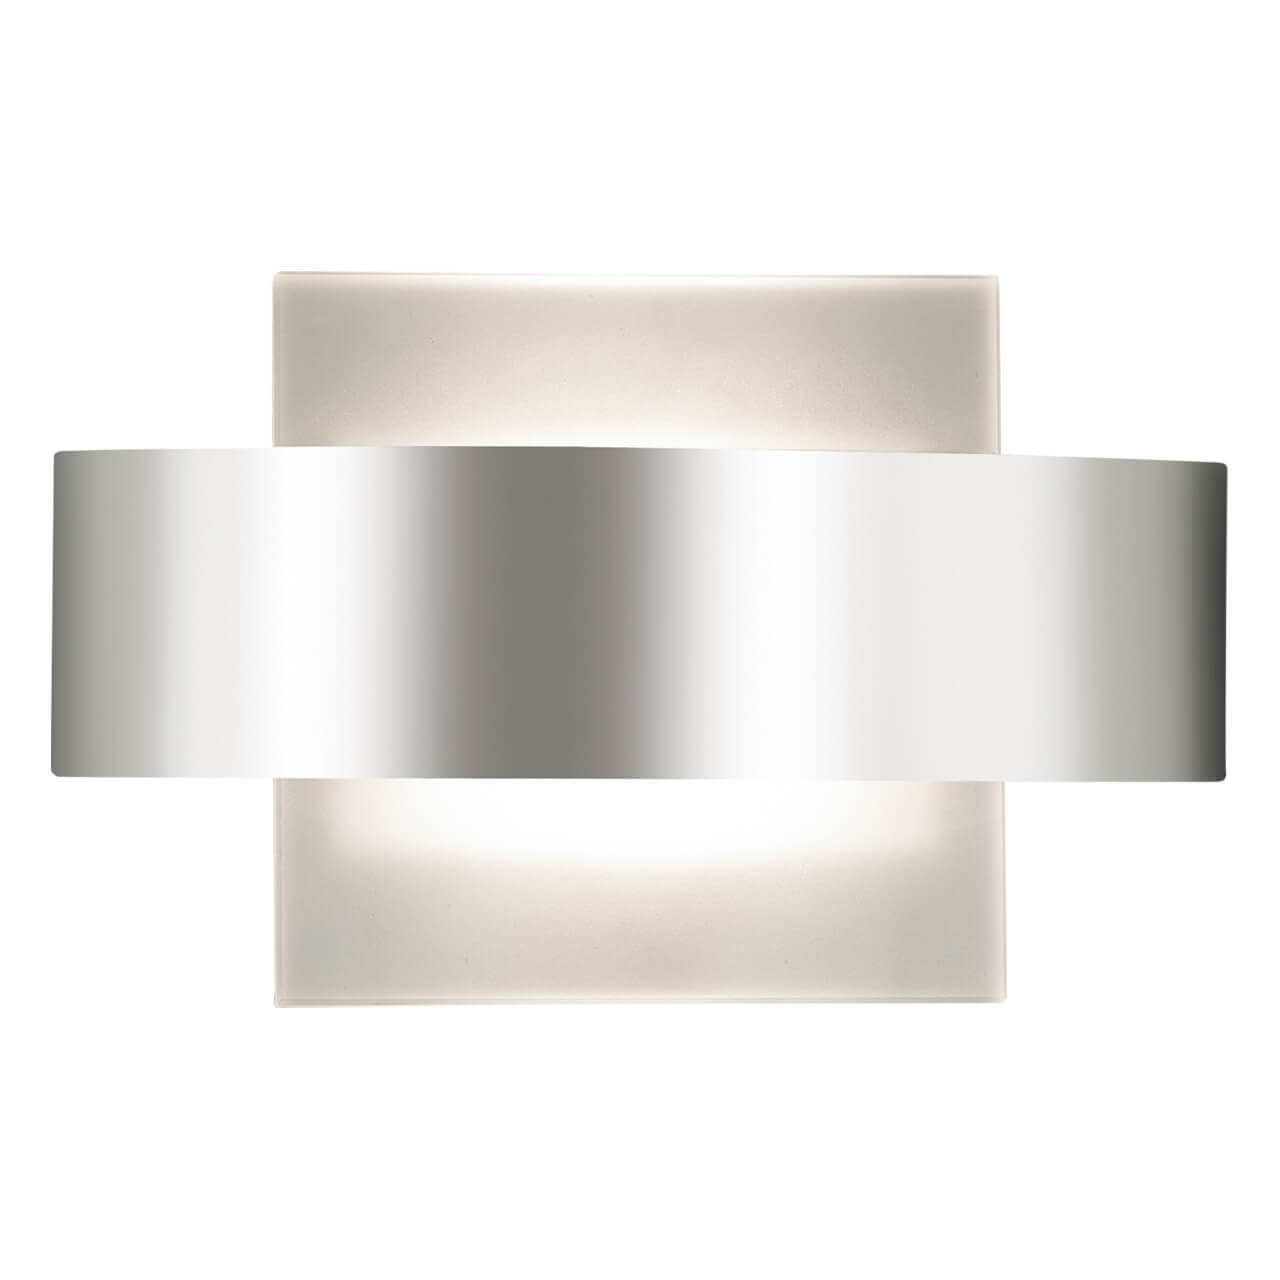 Светильник Odeon Light 2733/1W Gufi настенный светильник odeon light tiara 2186 1w